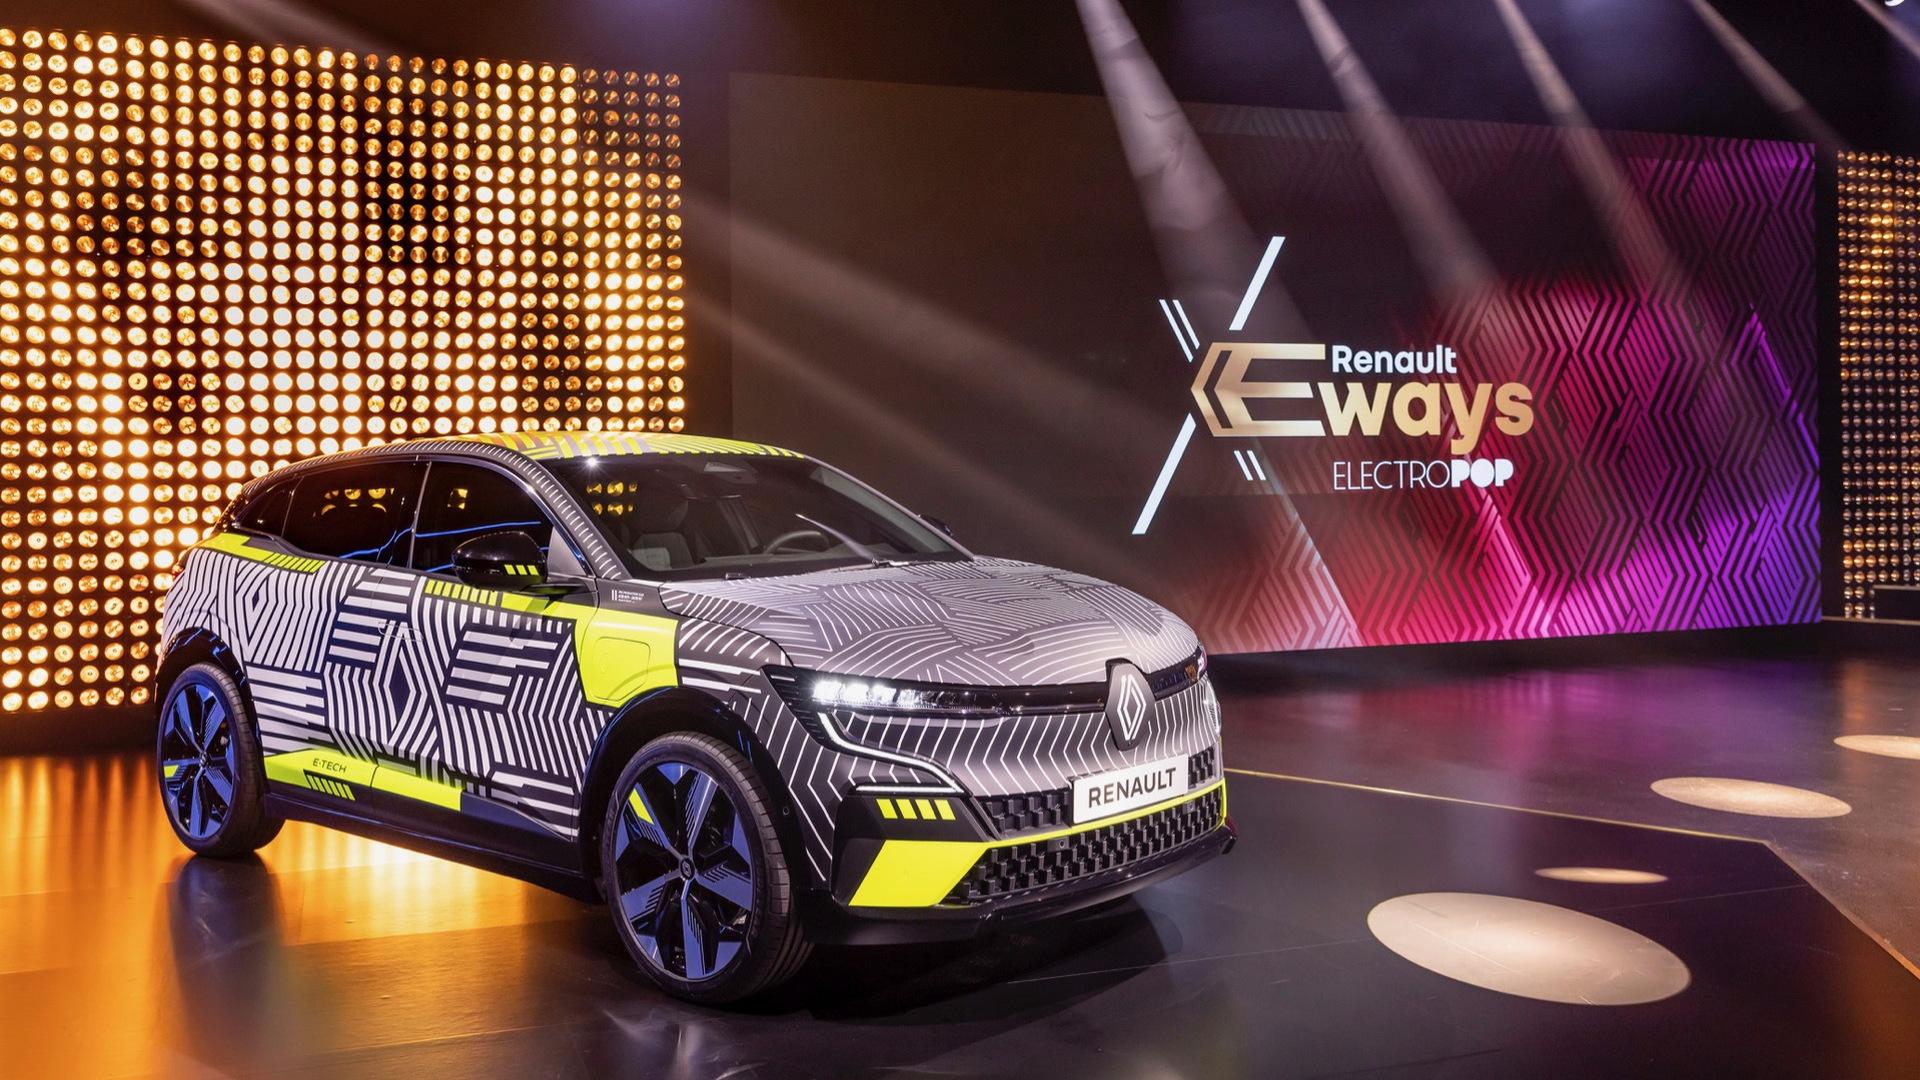 Renault eWays ElectroPop presentation